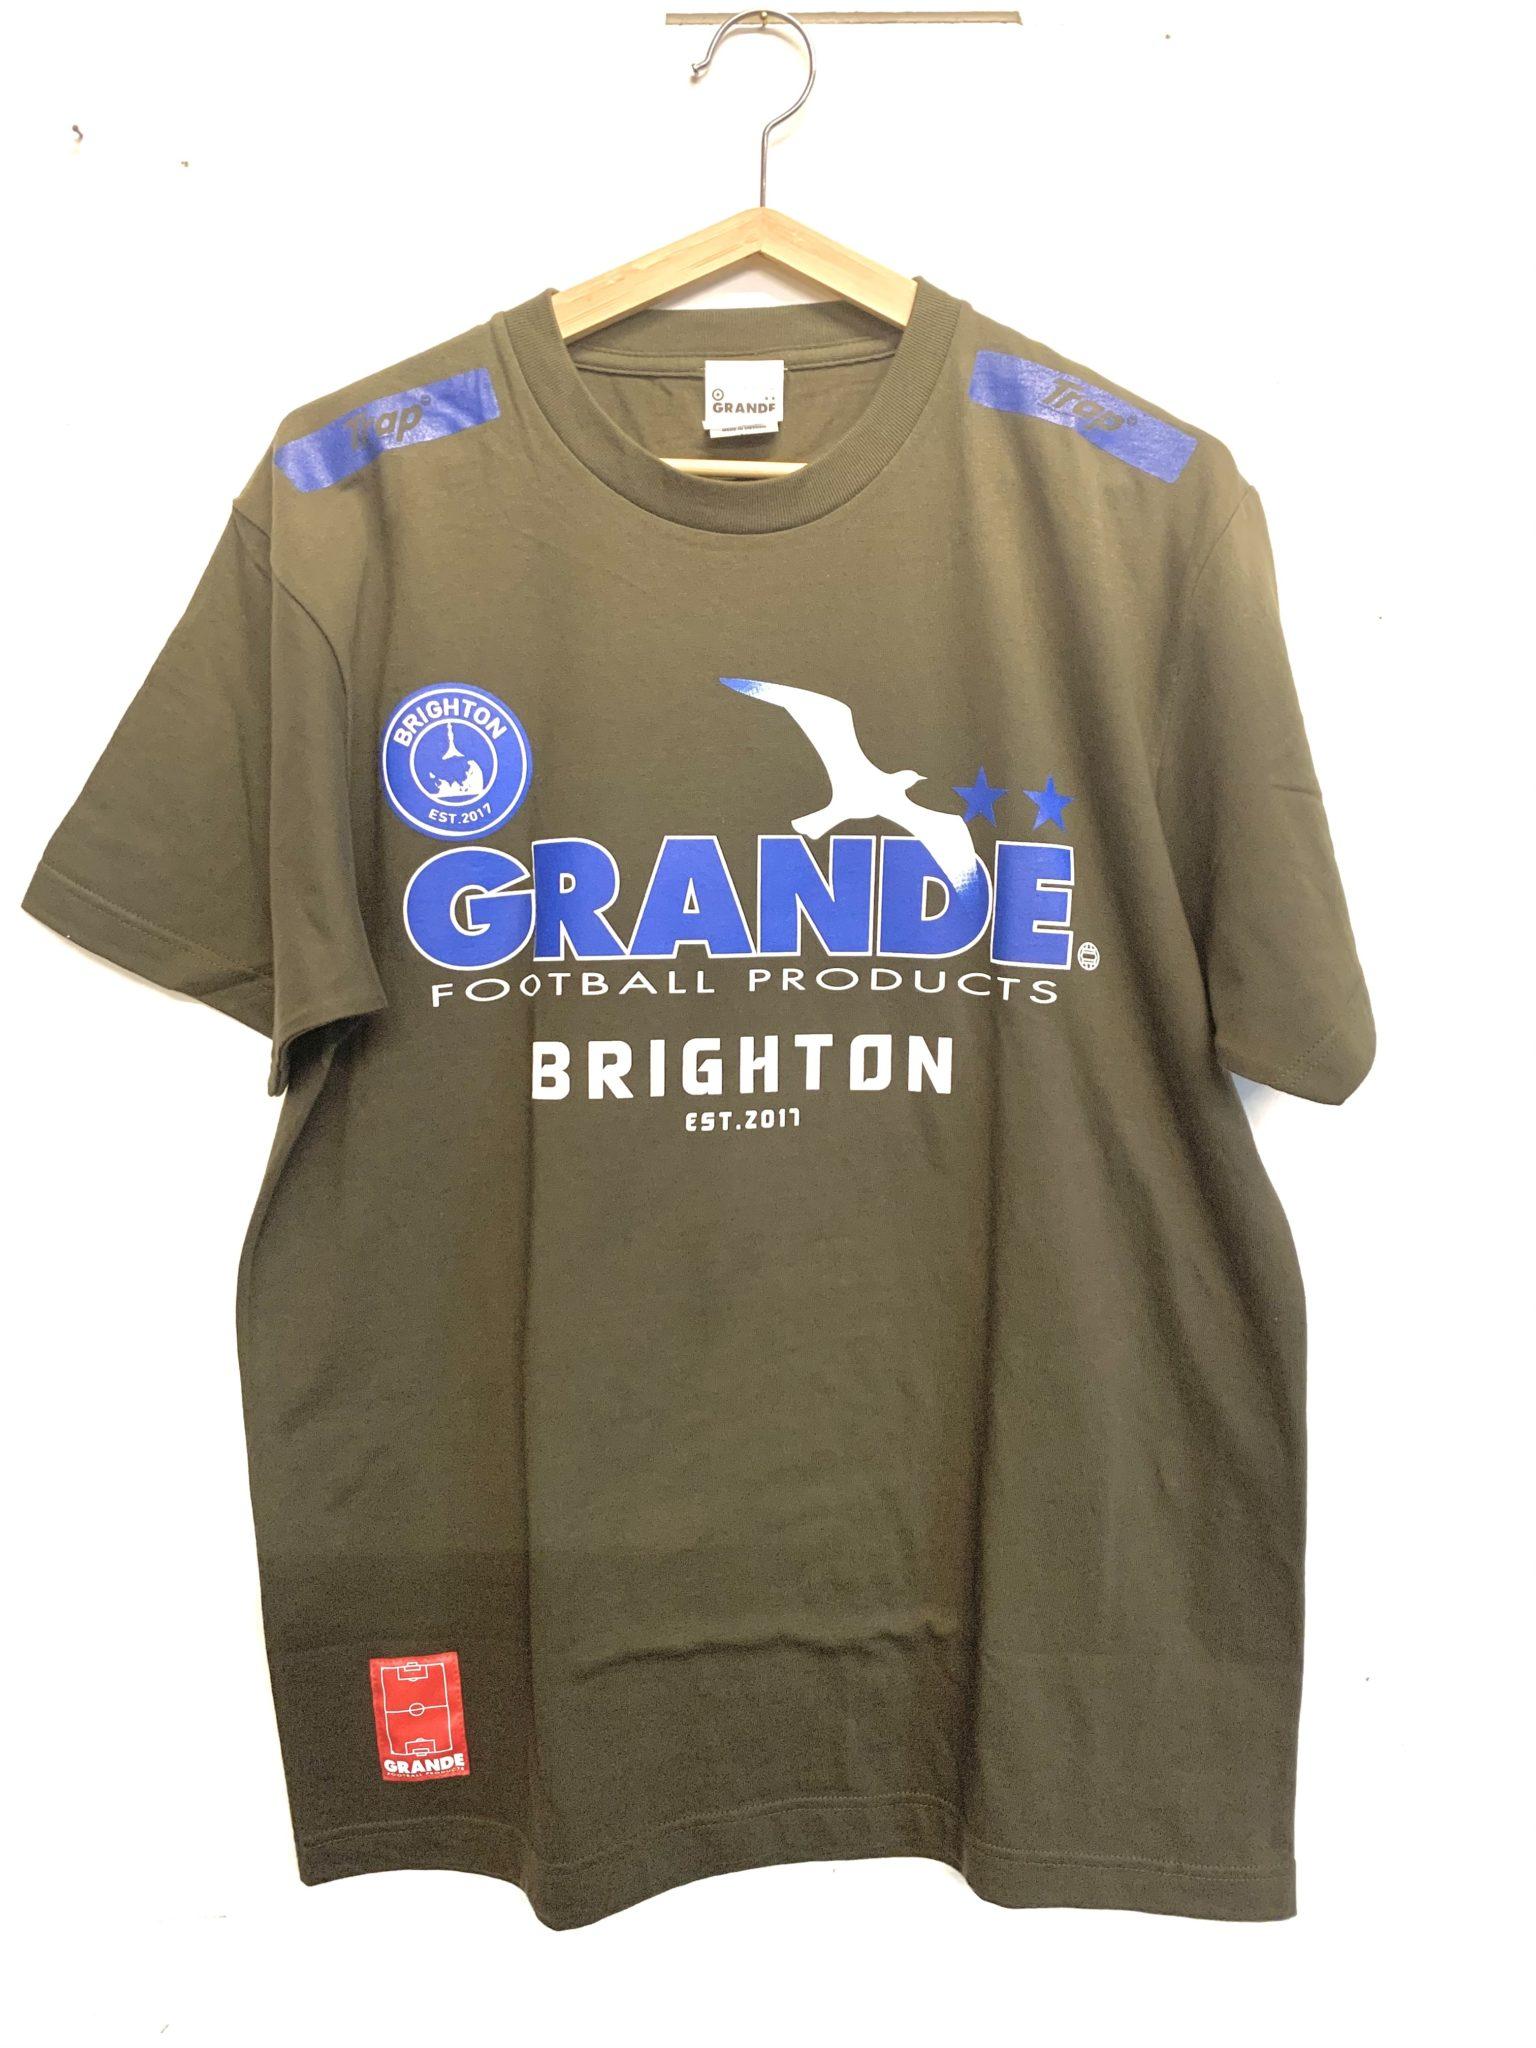 BRIGHTON × GRANDE T-Shirts